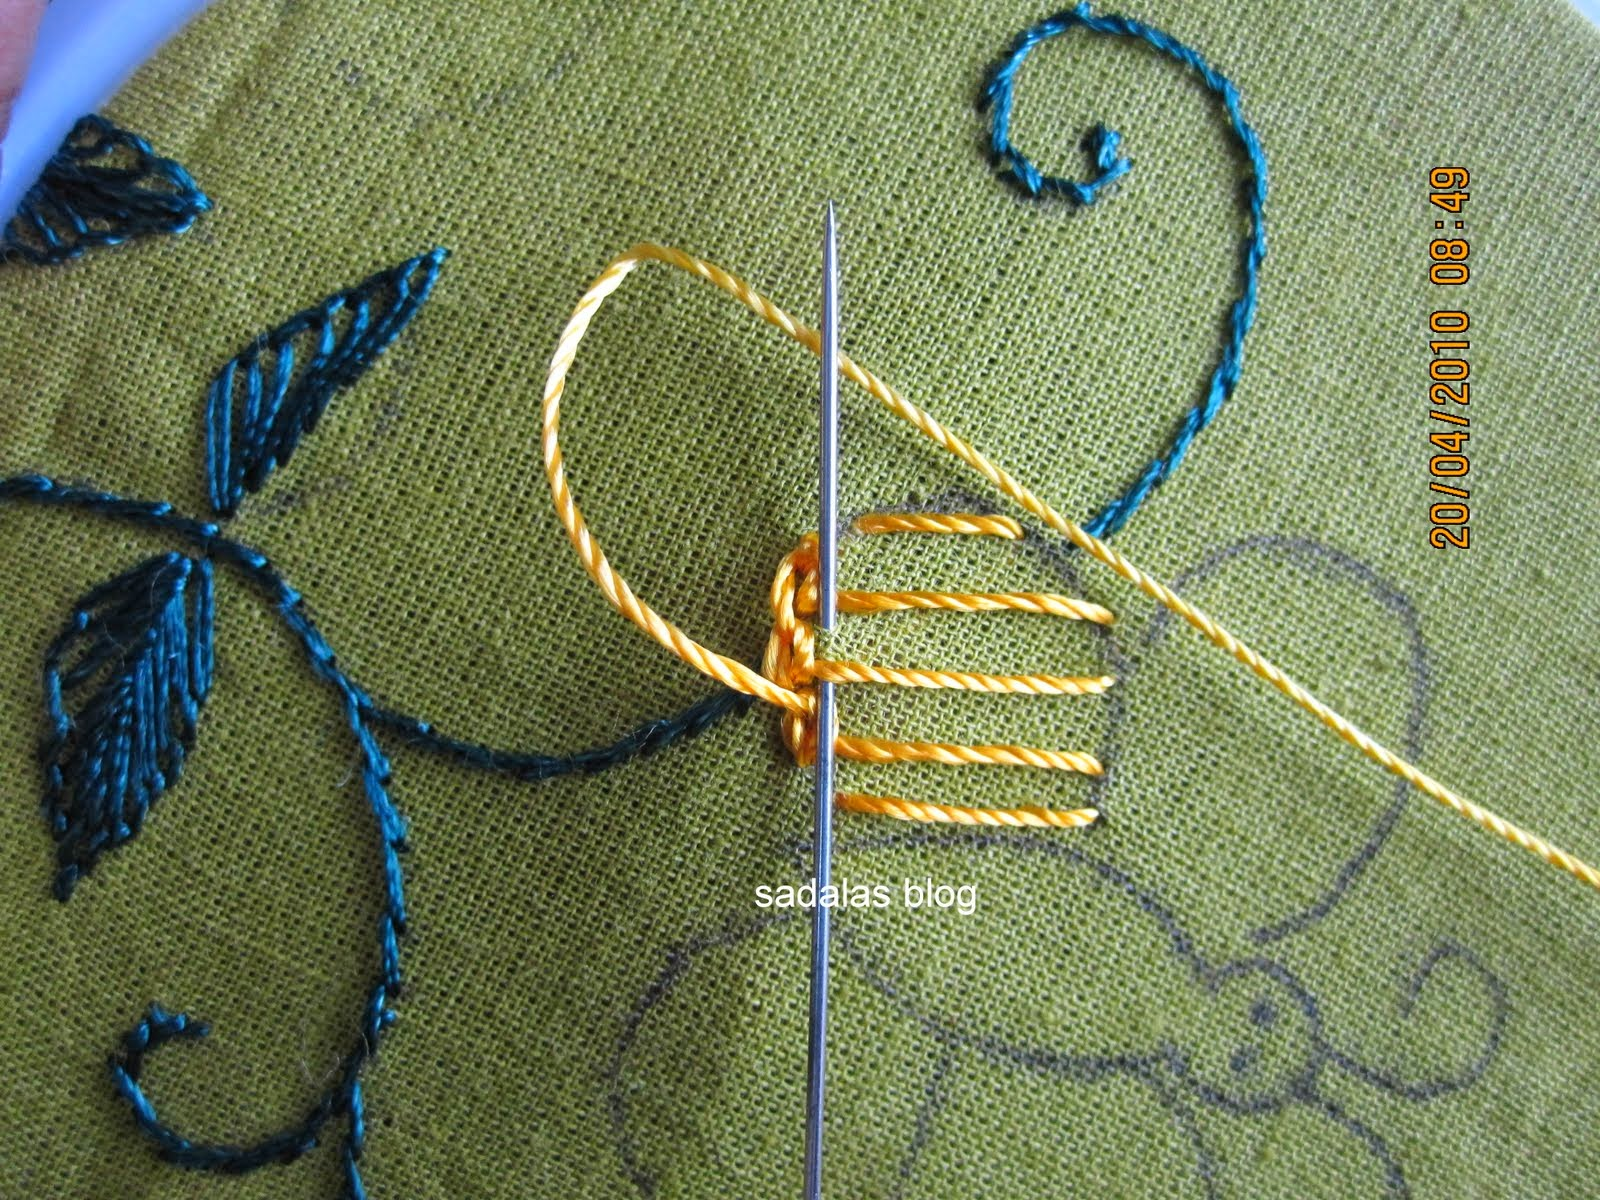 Aari Embroidery Stitches Tutorial Ausbeta